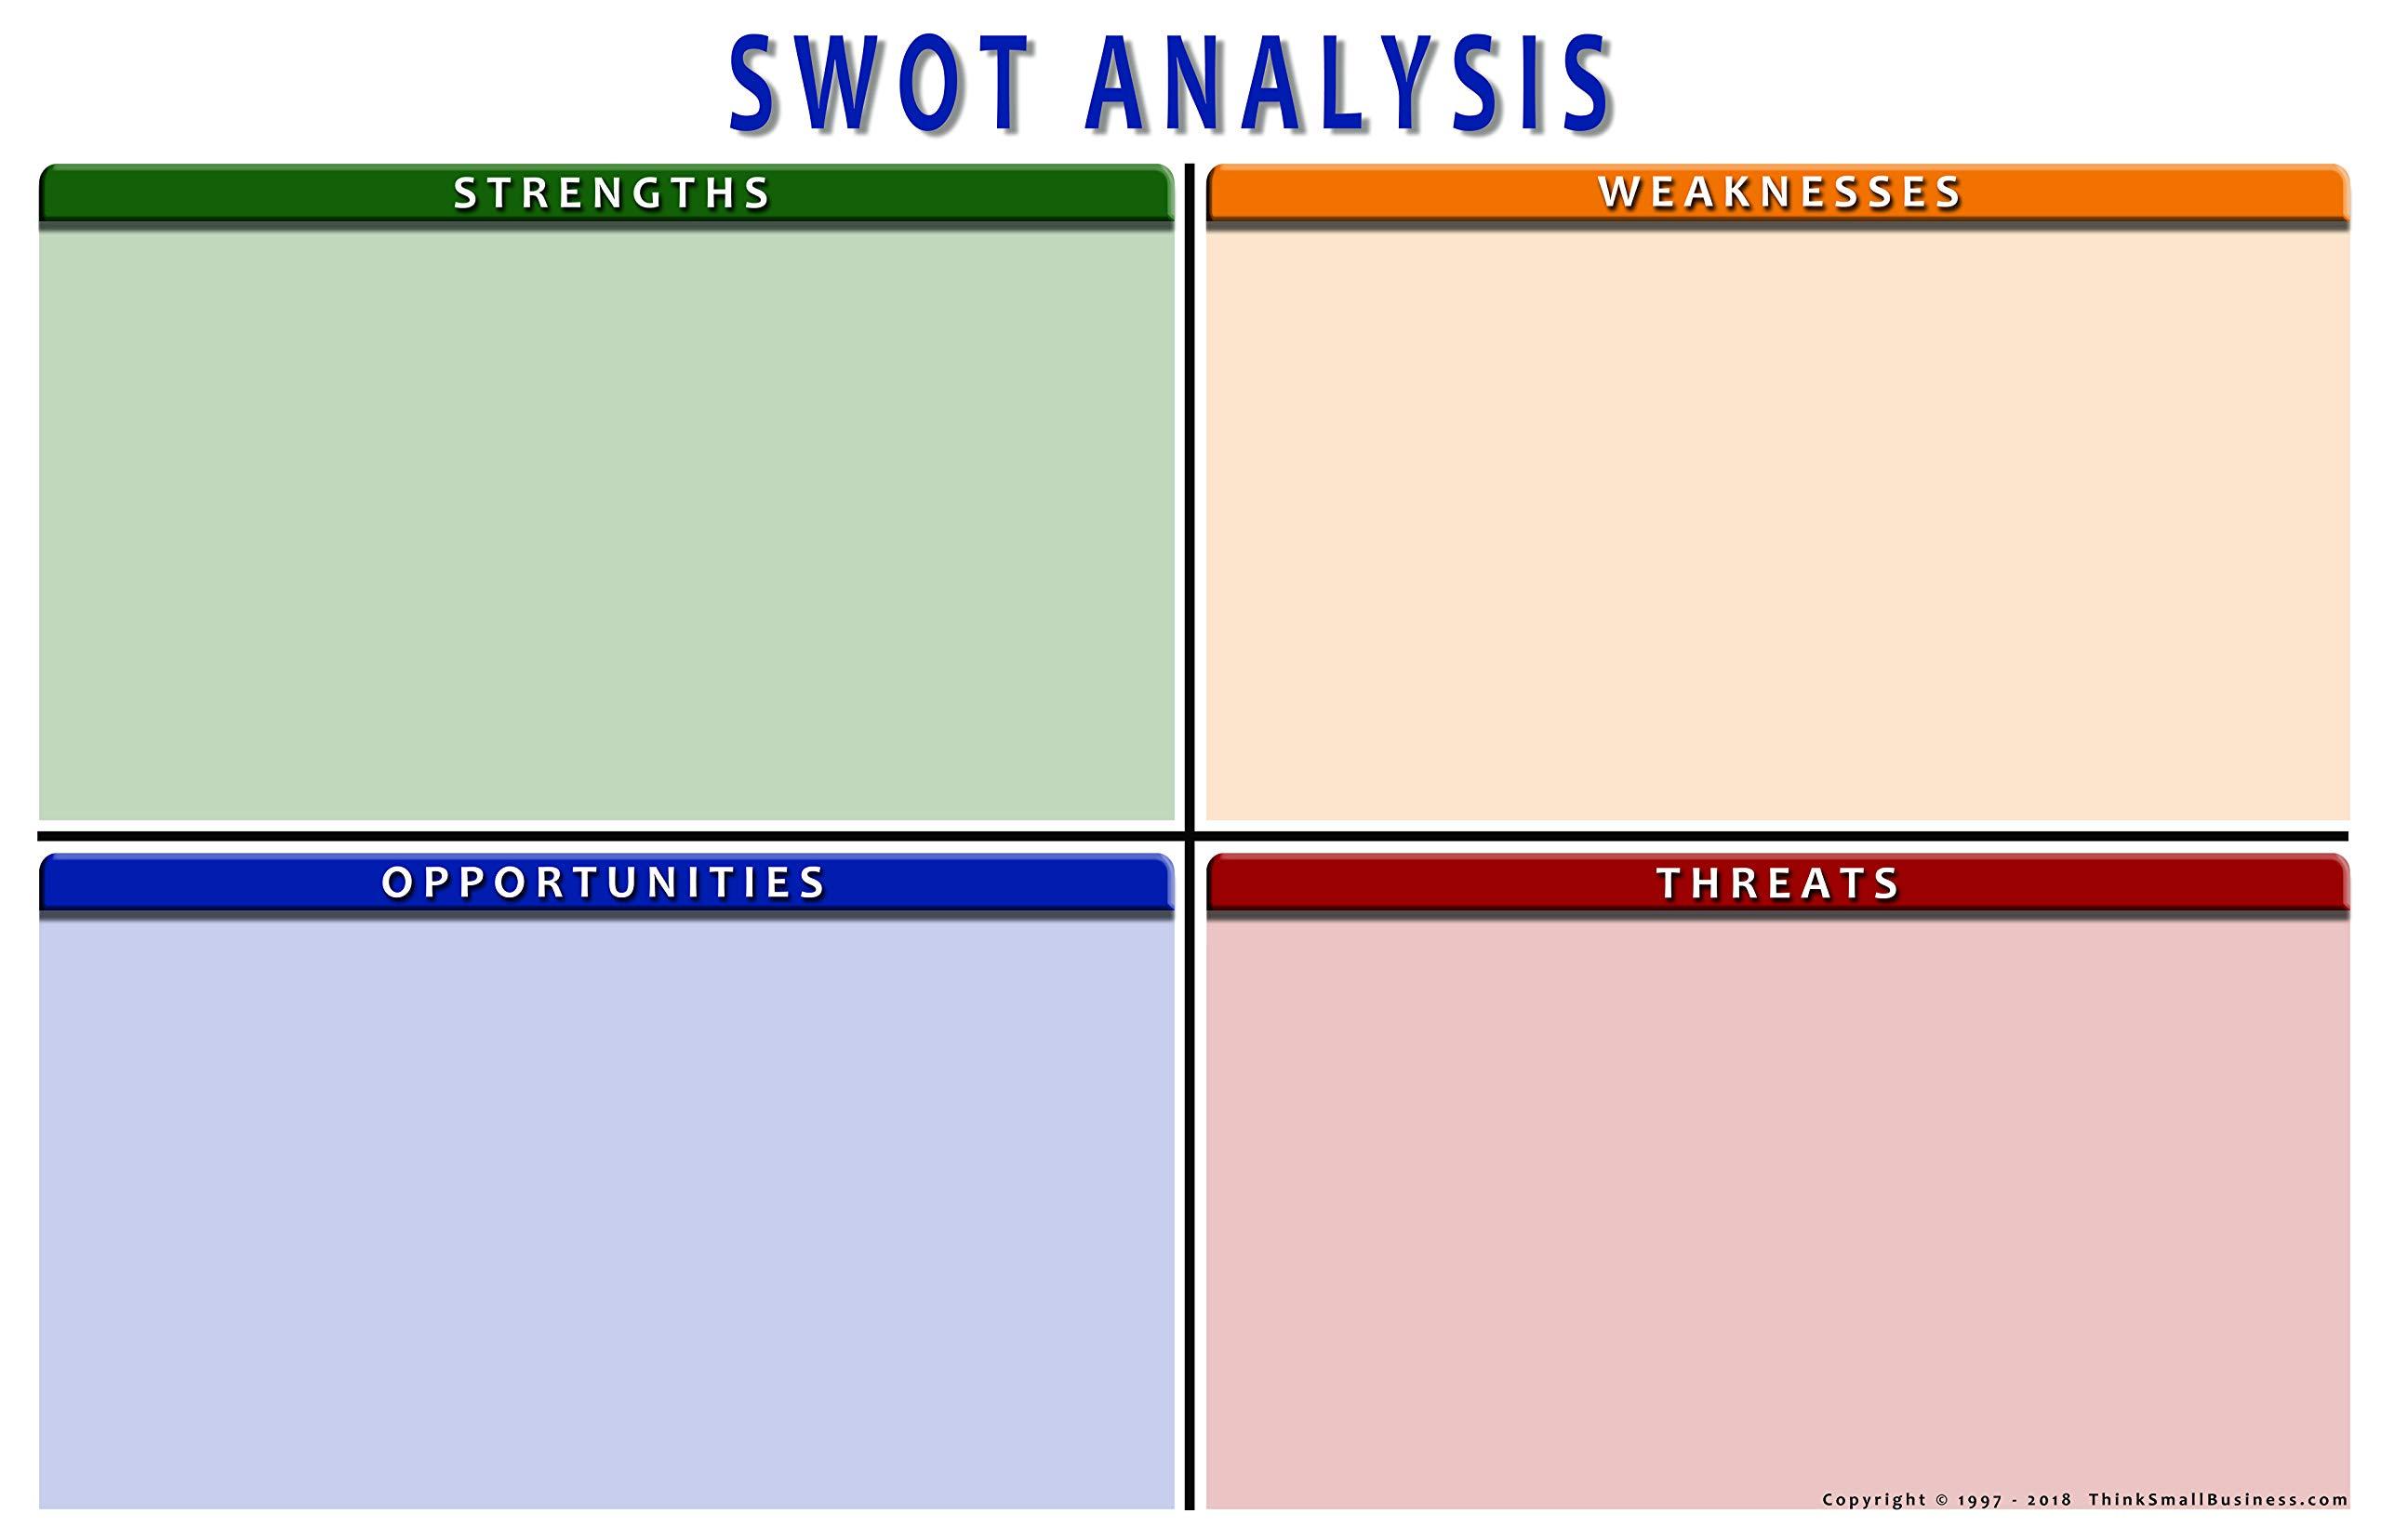 SWOT Analysis Erasable Reusable Wall Poster - Strengths Weakness Opportunities Threats Plus Cheat Sheet Guide